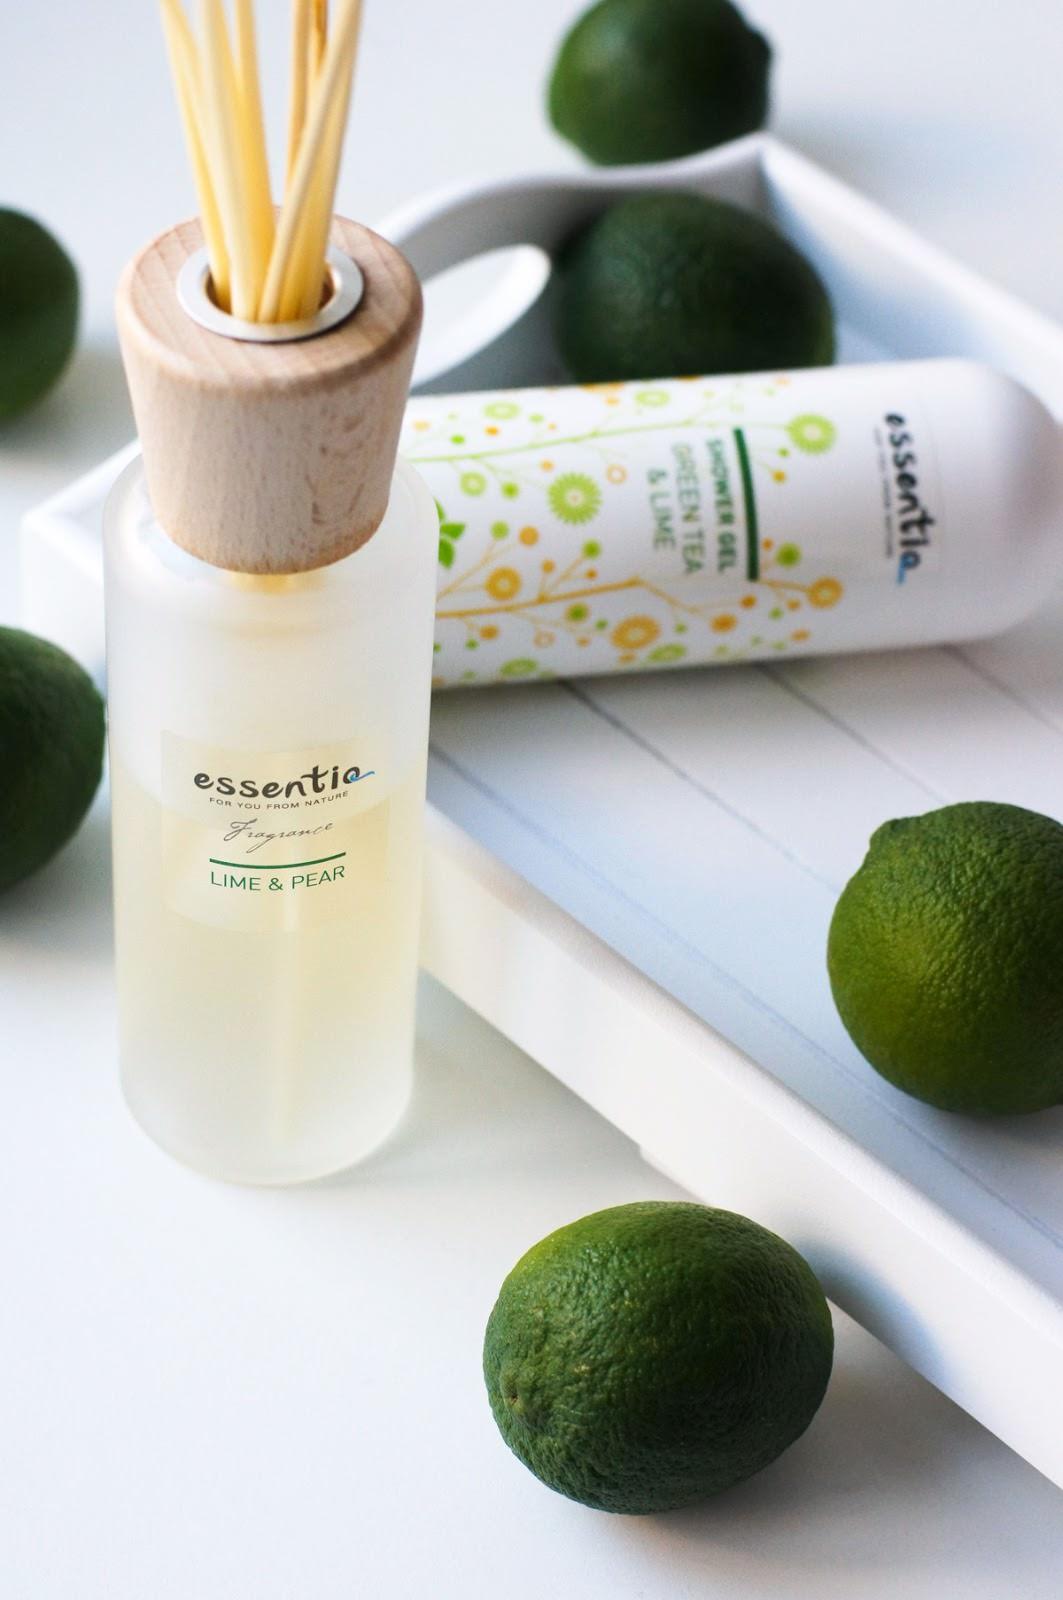 Essentiq cosmetics